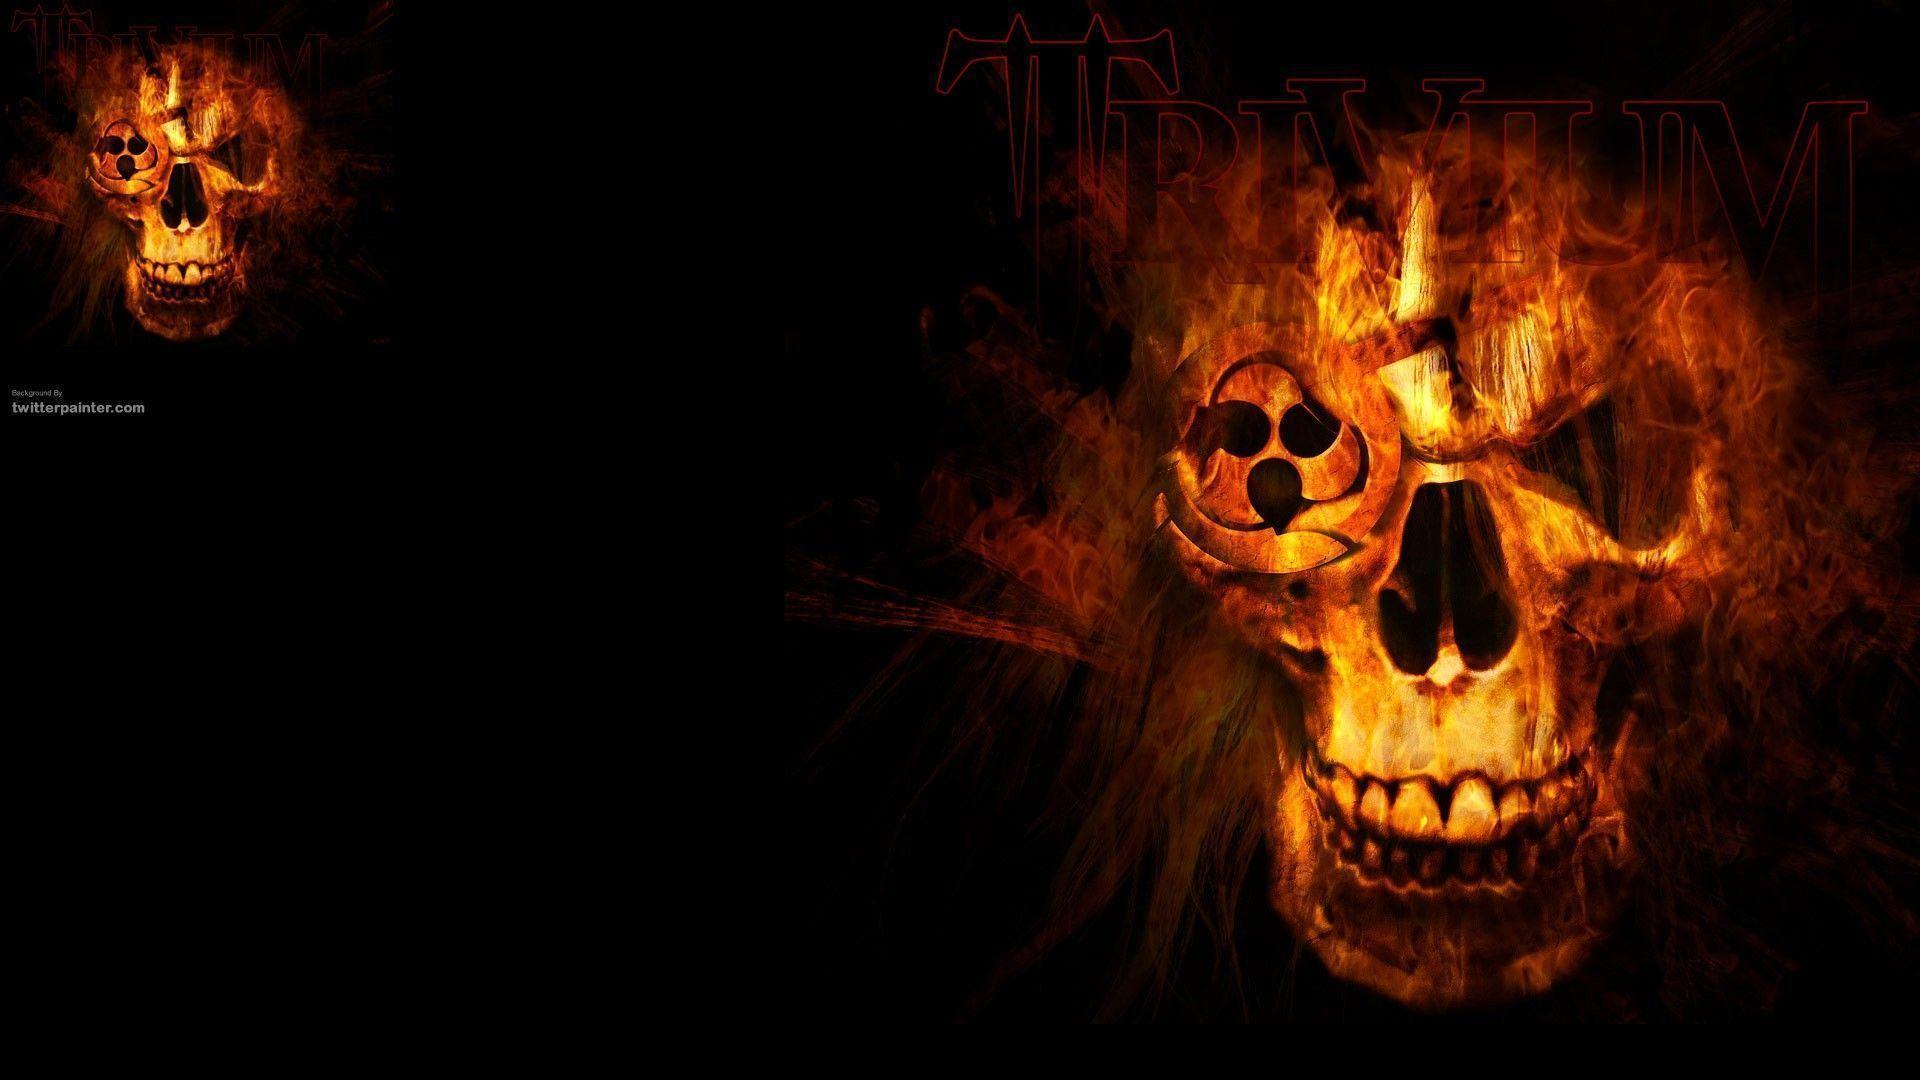 Fire Skull Wallpapers 1920x1080